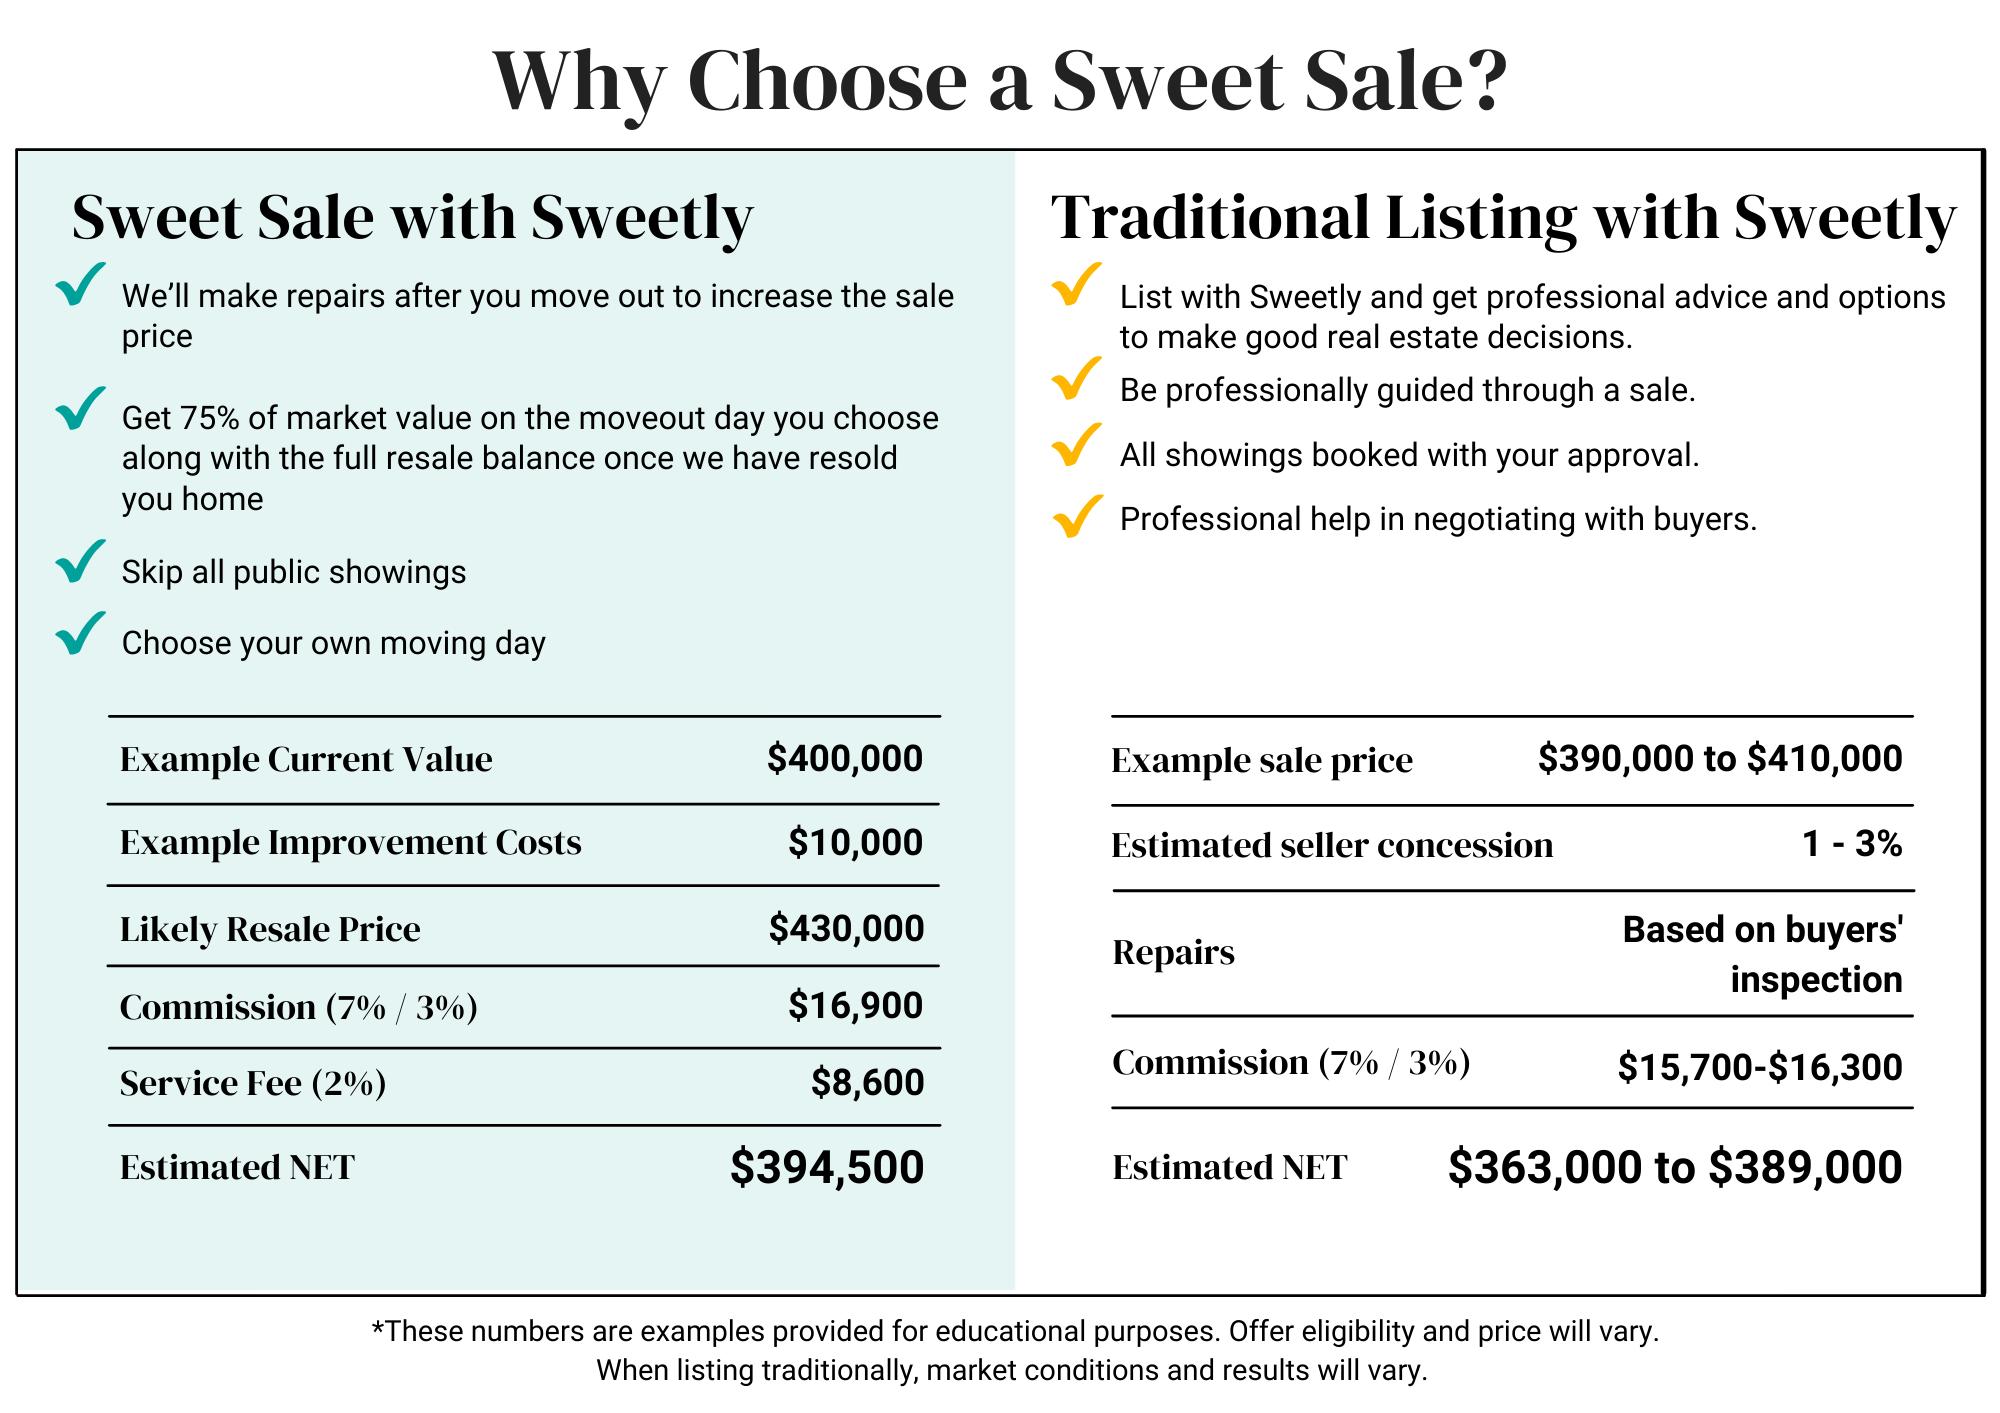 Why Choose a Sweet Sale?